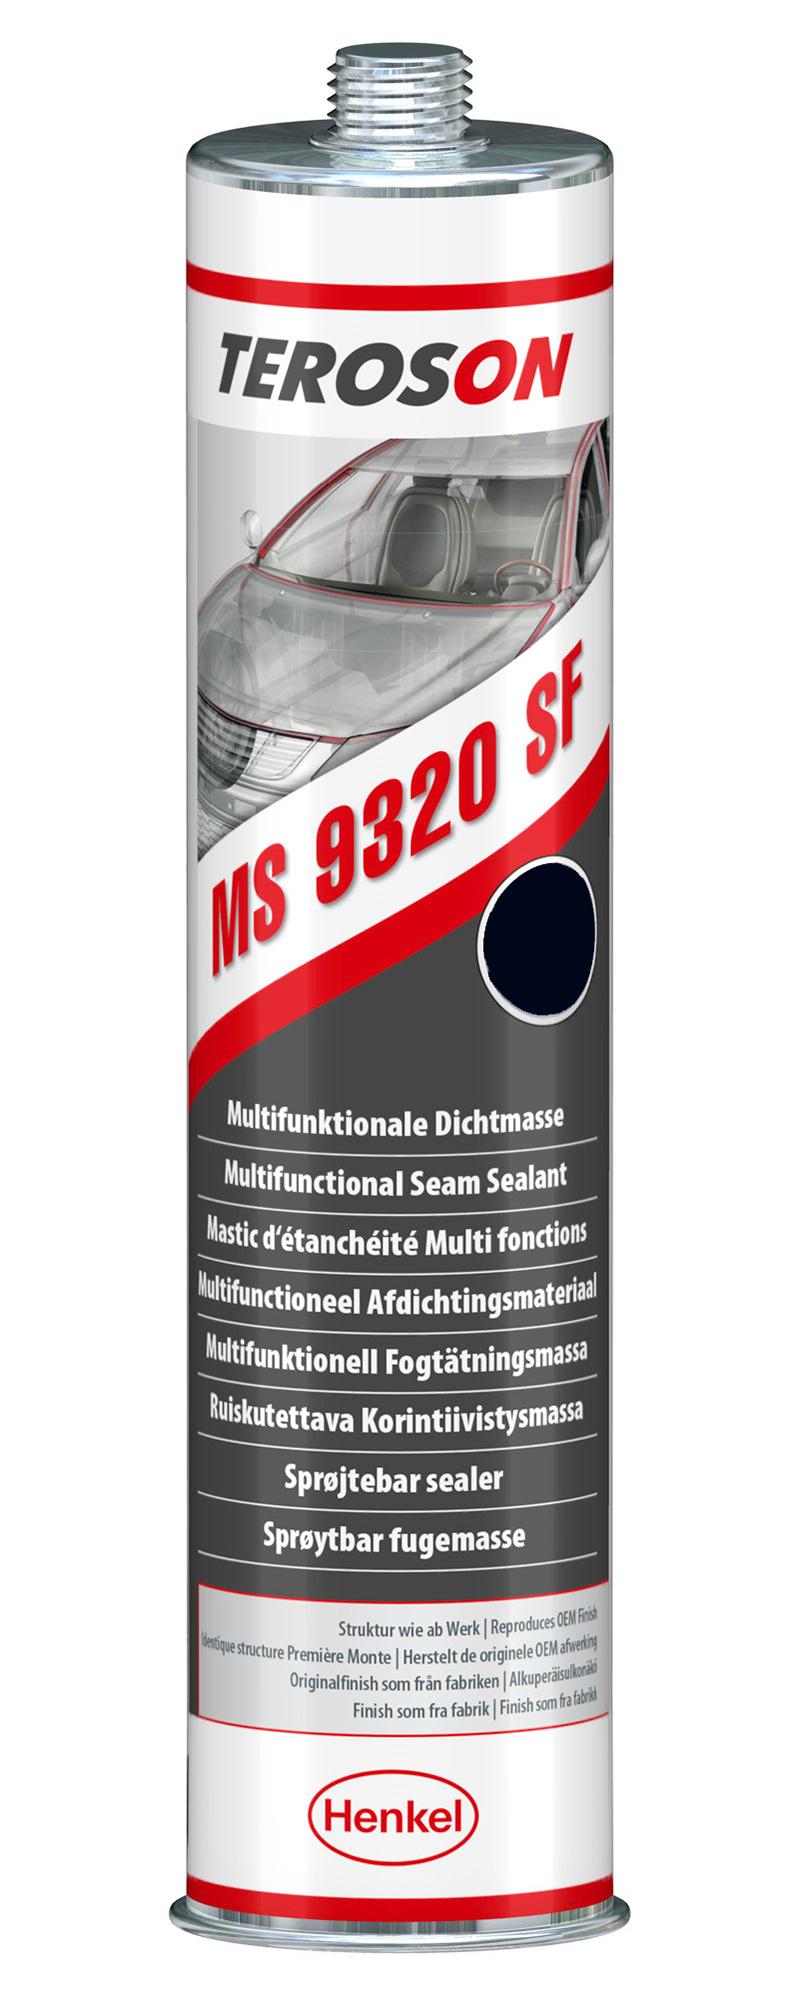 Teroson MS 9320 sf